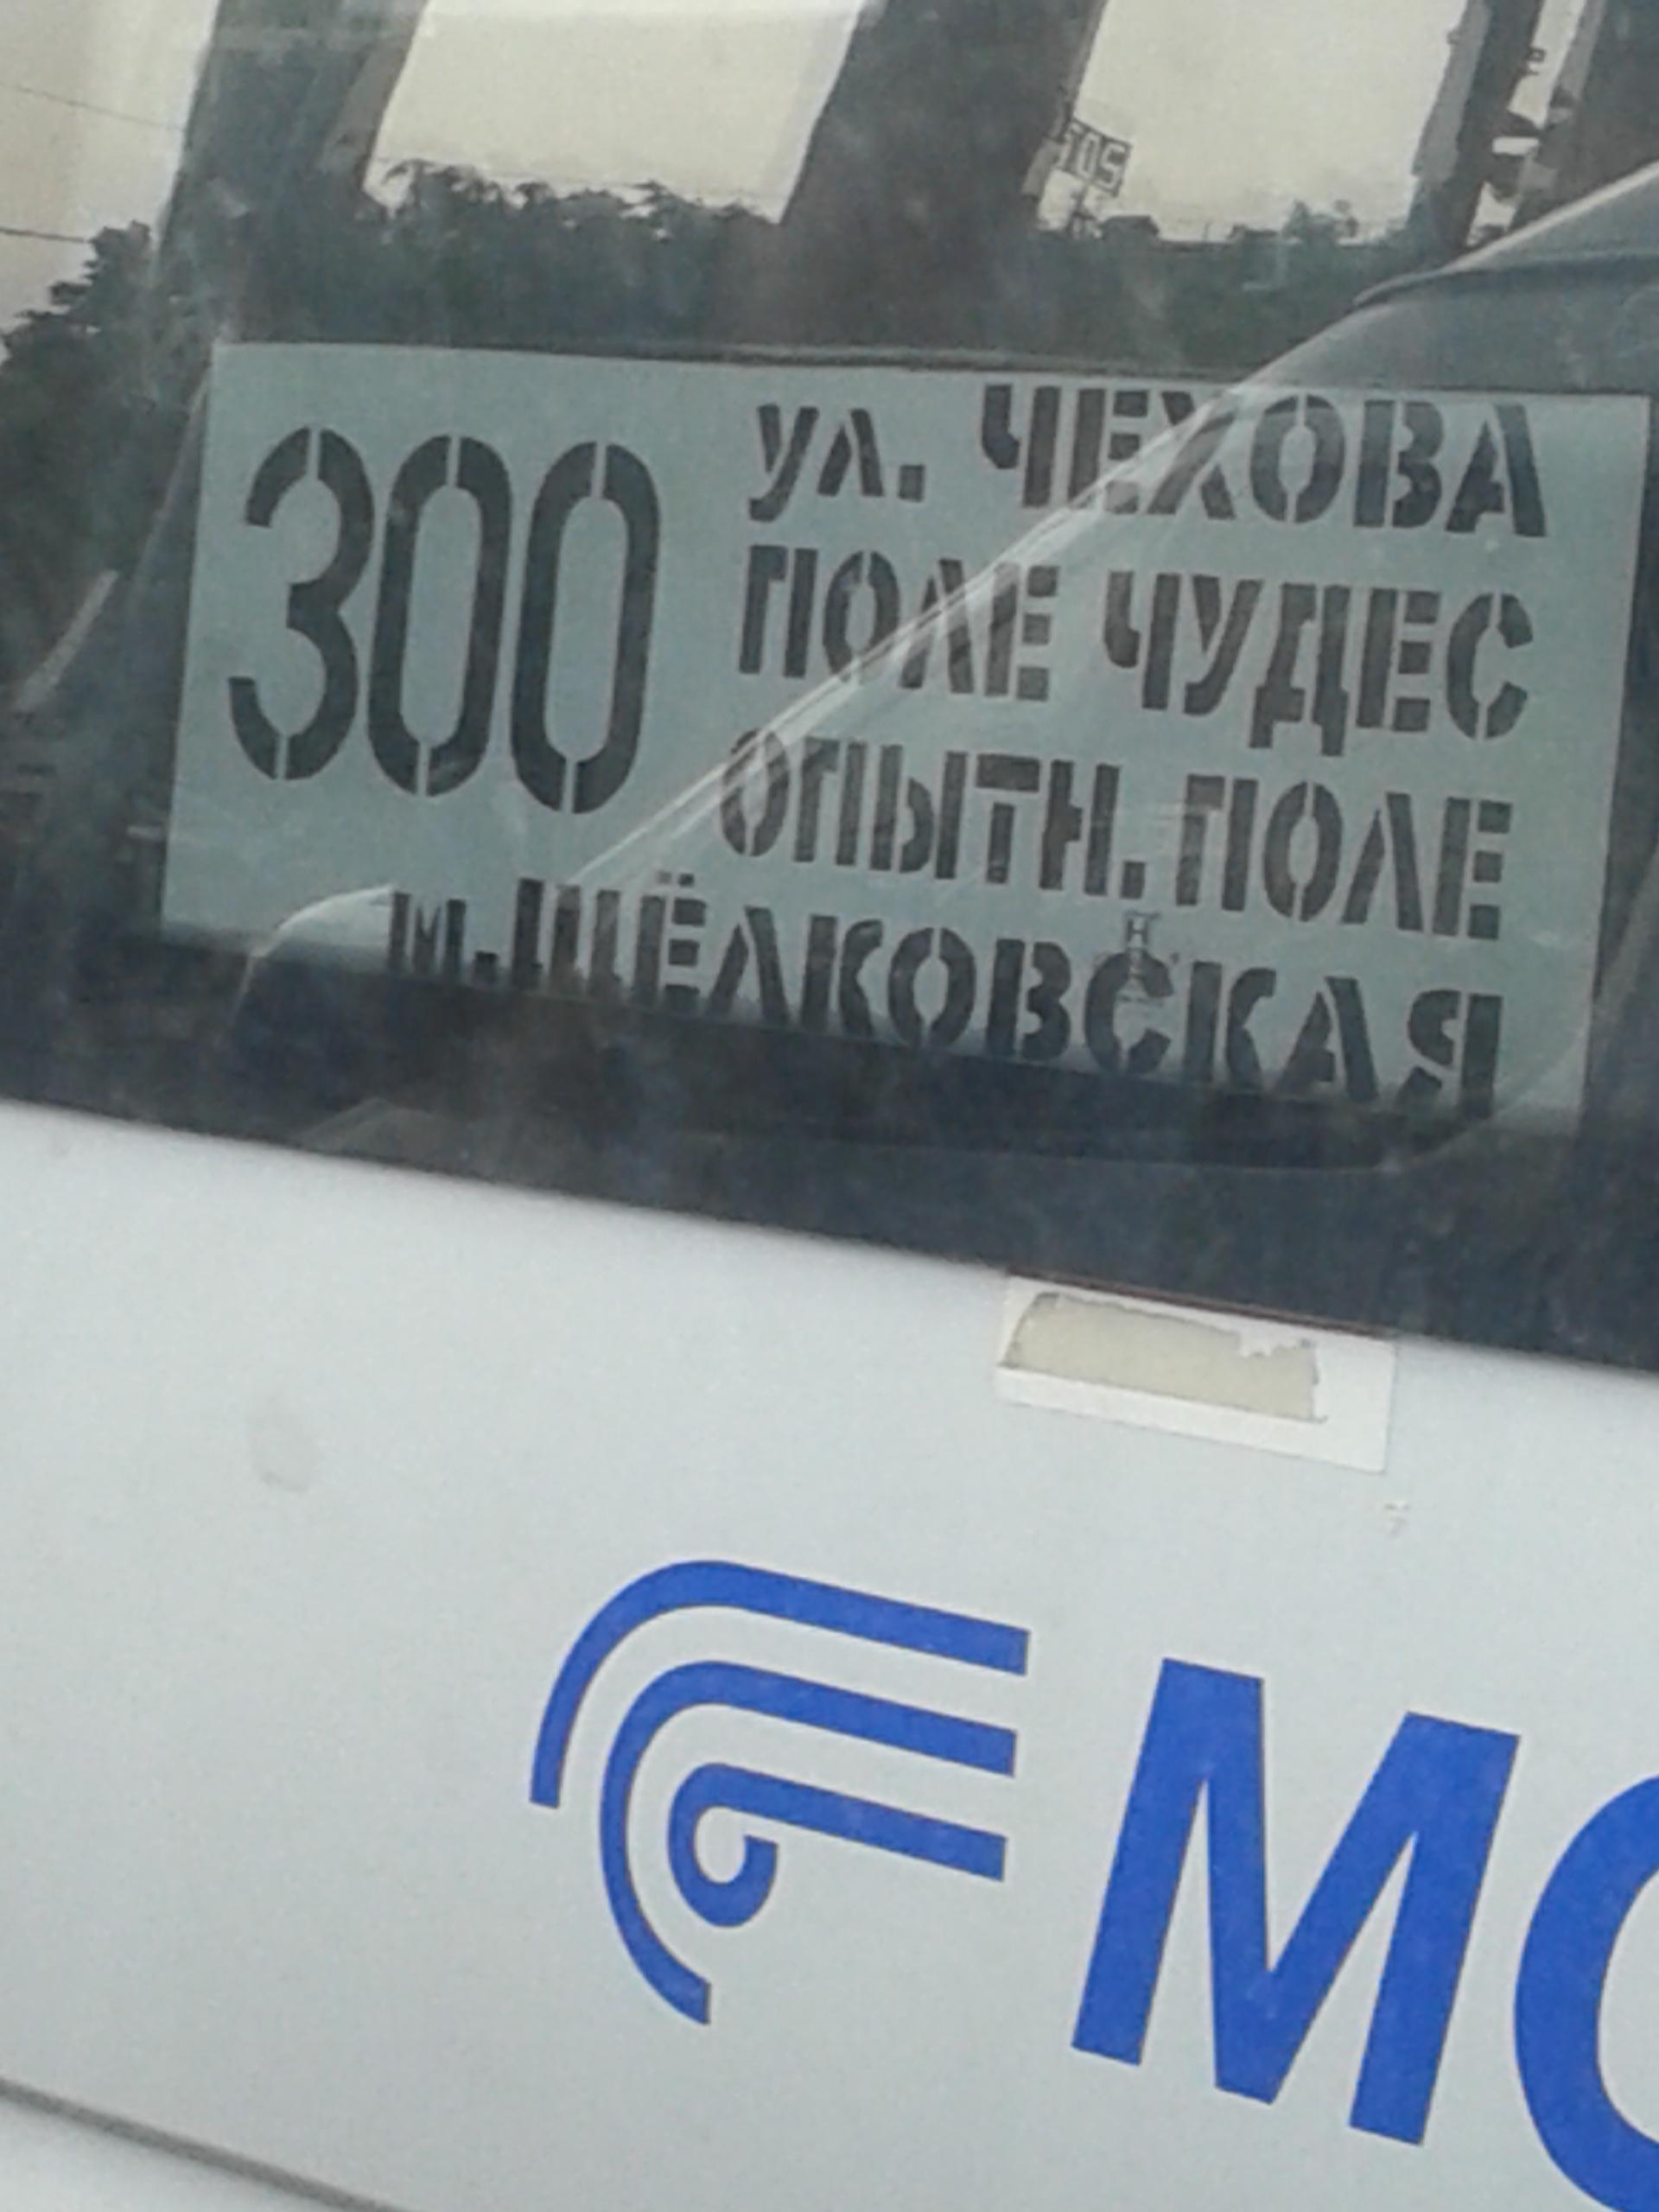 20120606_171714